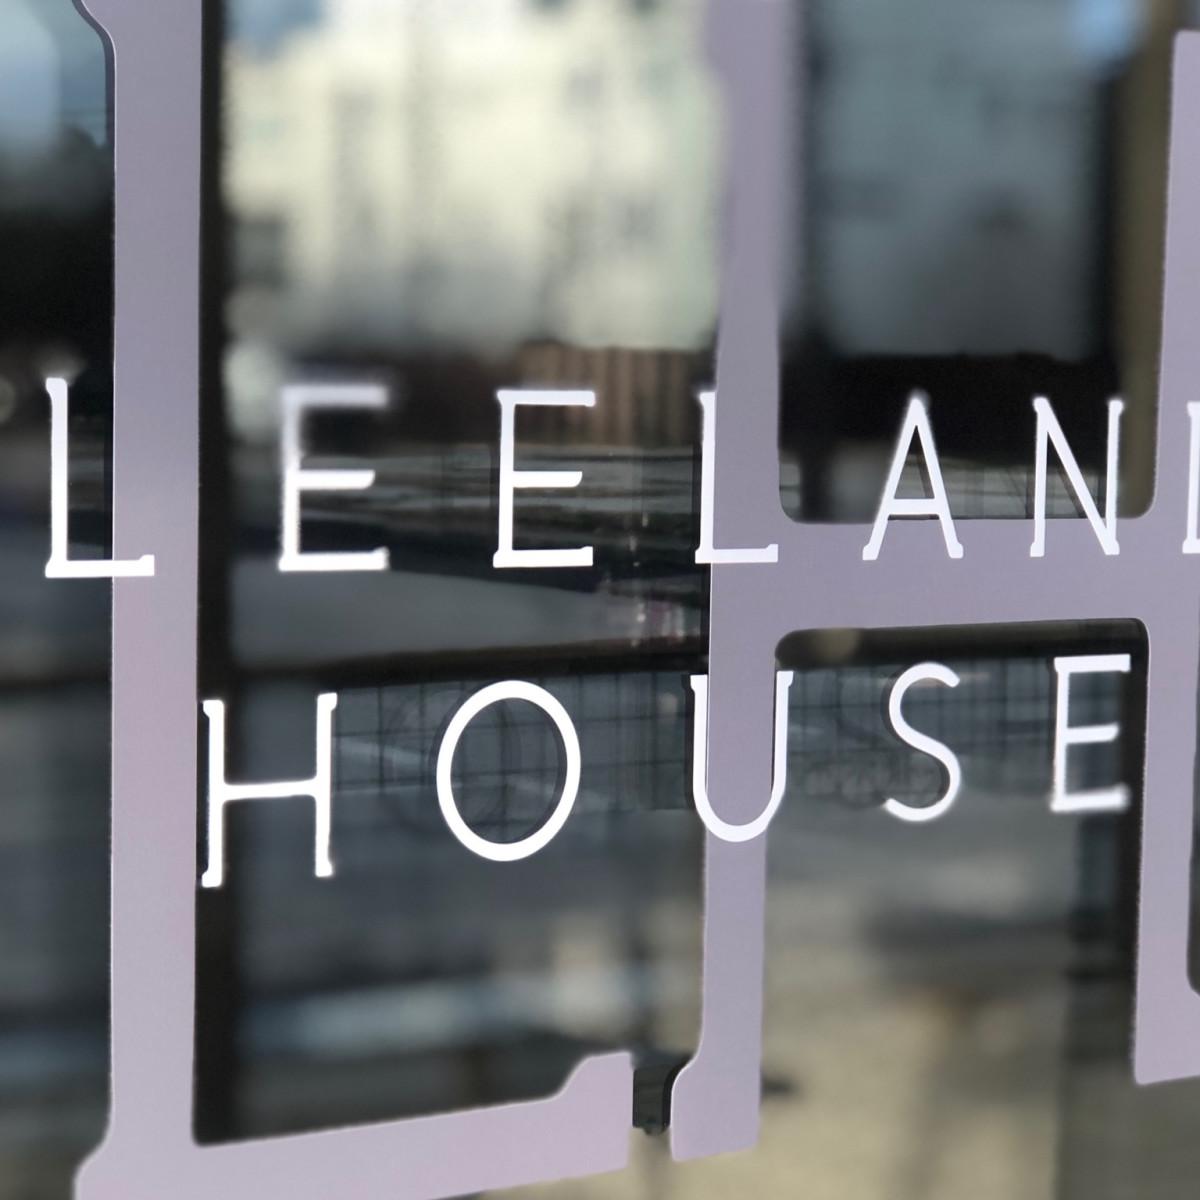 Leeland House sign